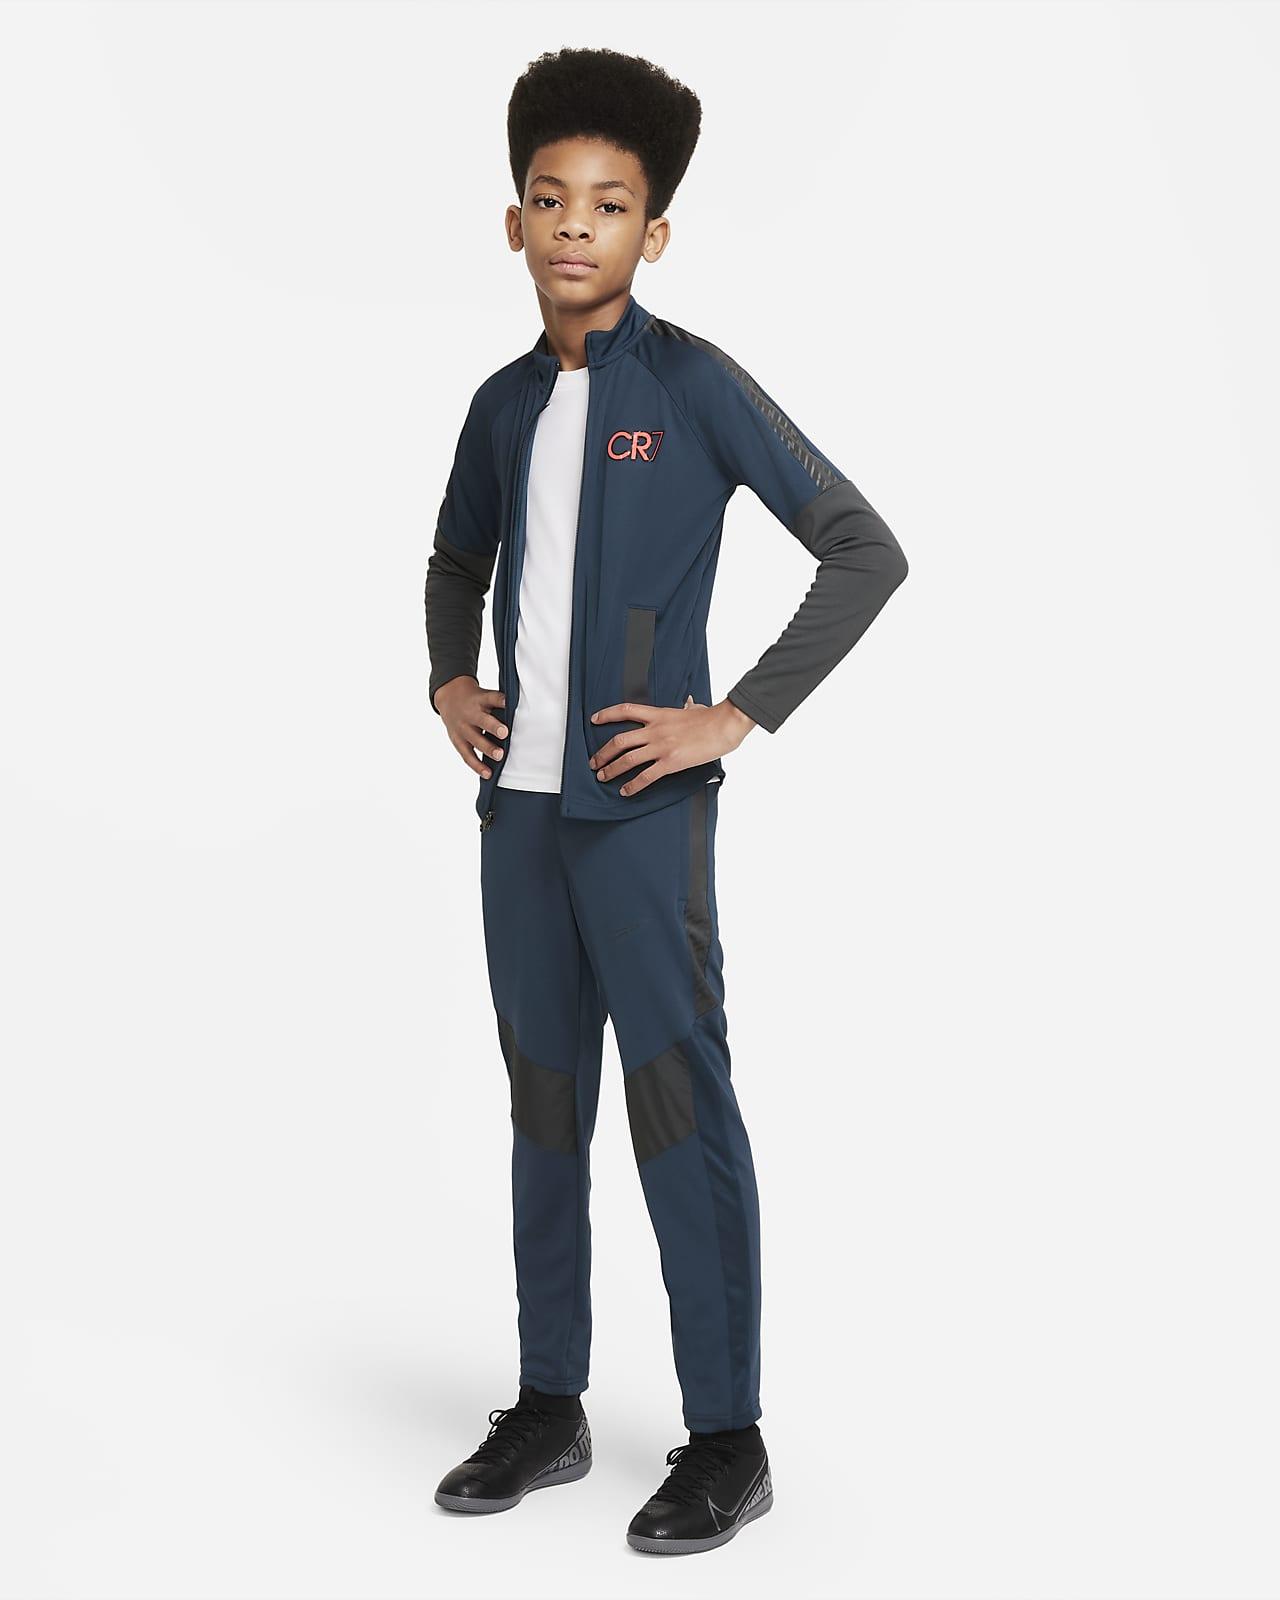 Nike Dri-FIT CR7 Genç Çocuk Futbol Eşofmanı